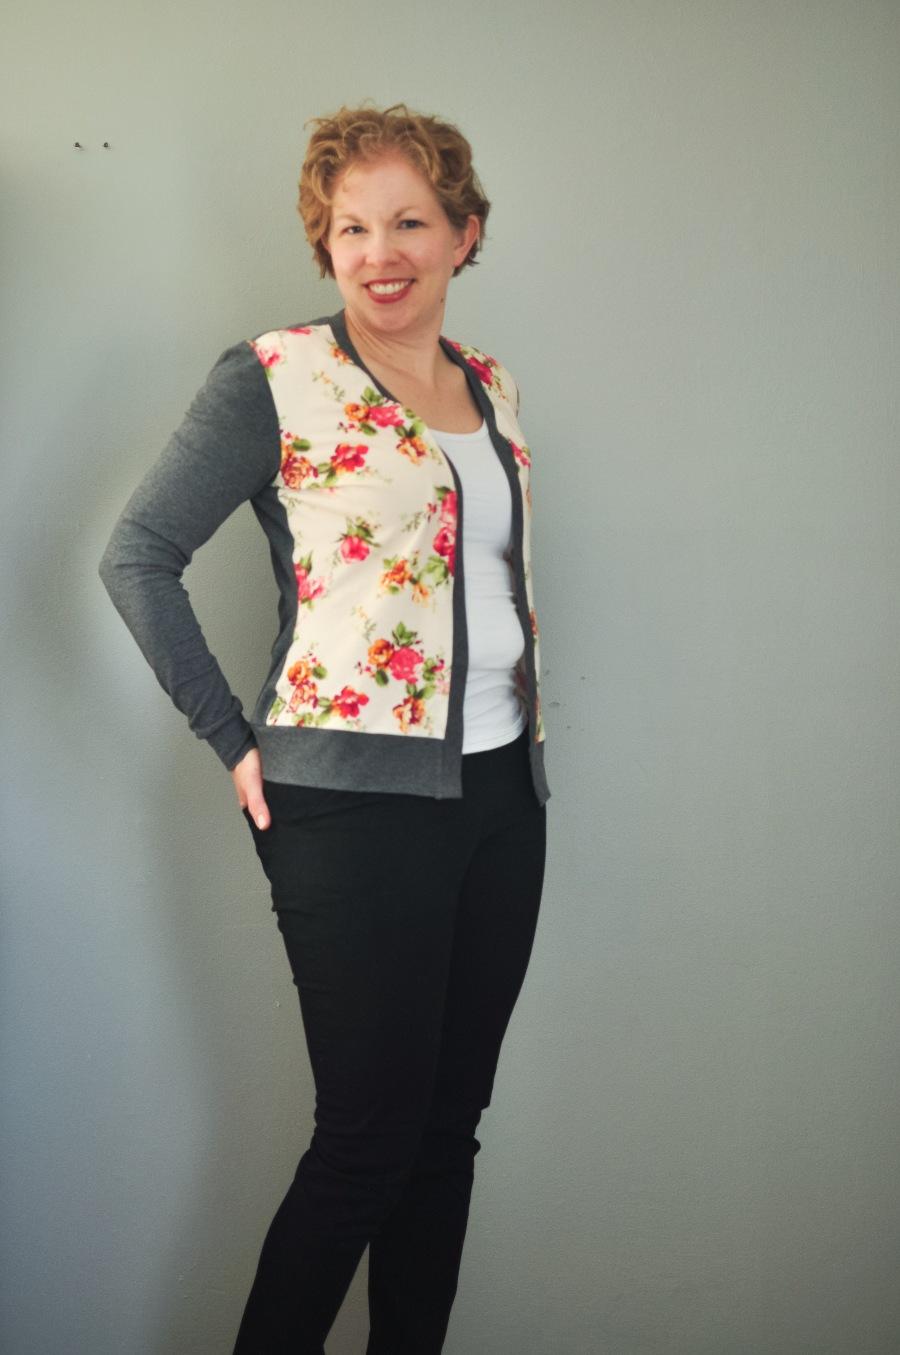 Creative Counselor: Sabrina Fail